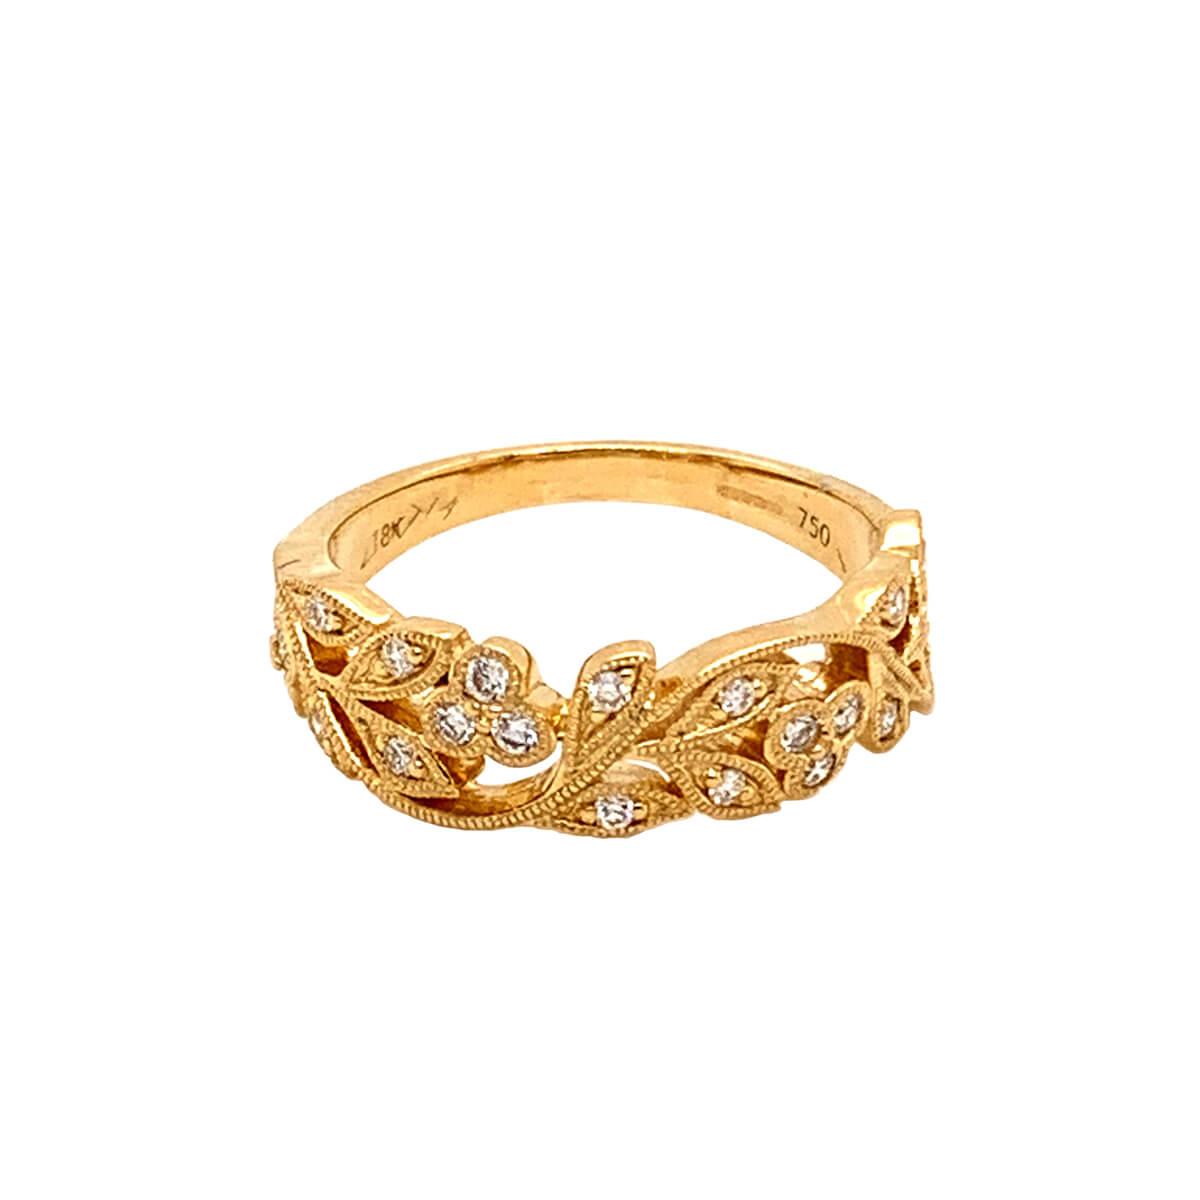 Leaf Design 18ct Yellow Gold Diamond Ring